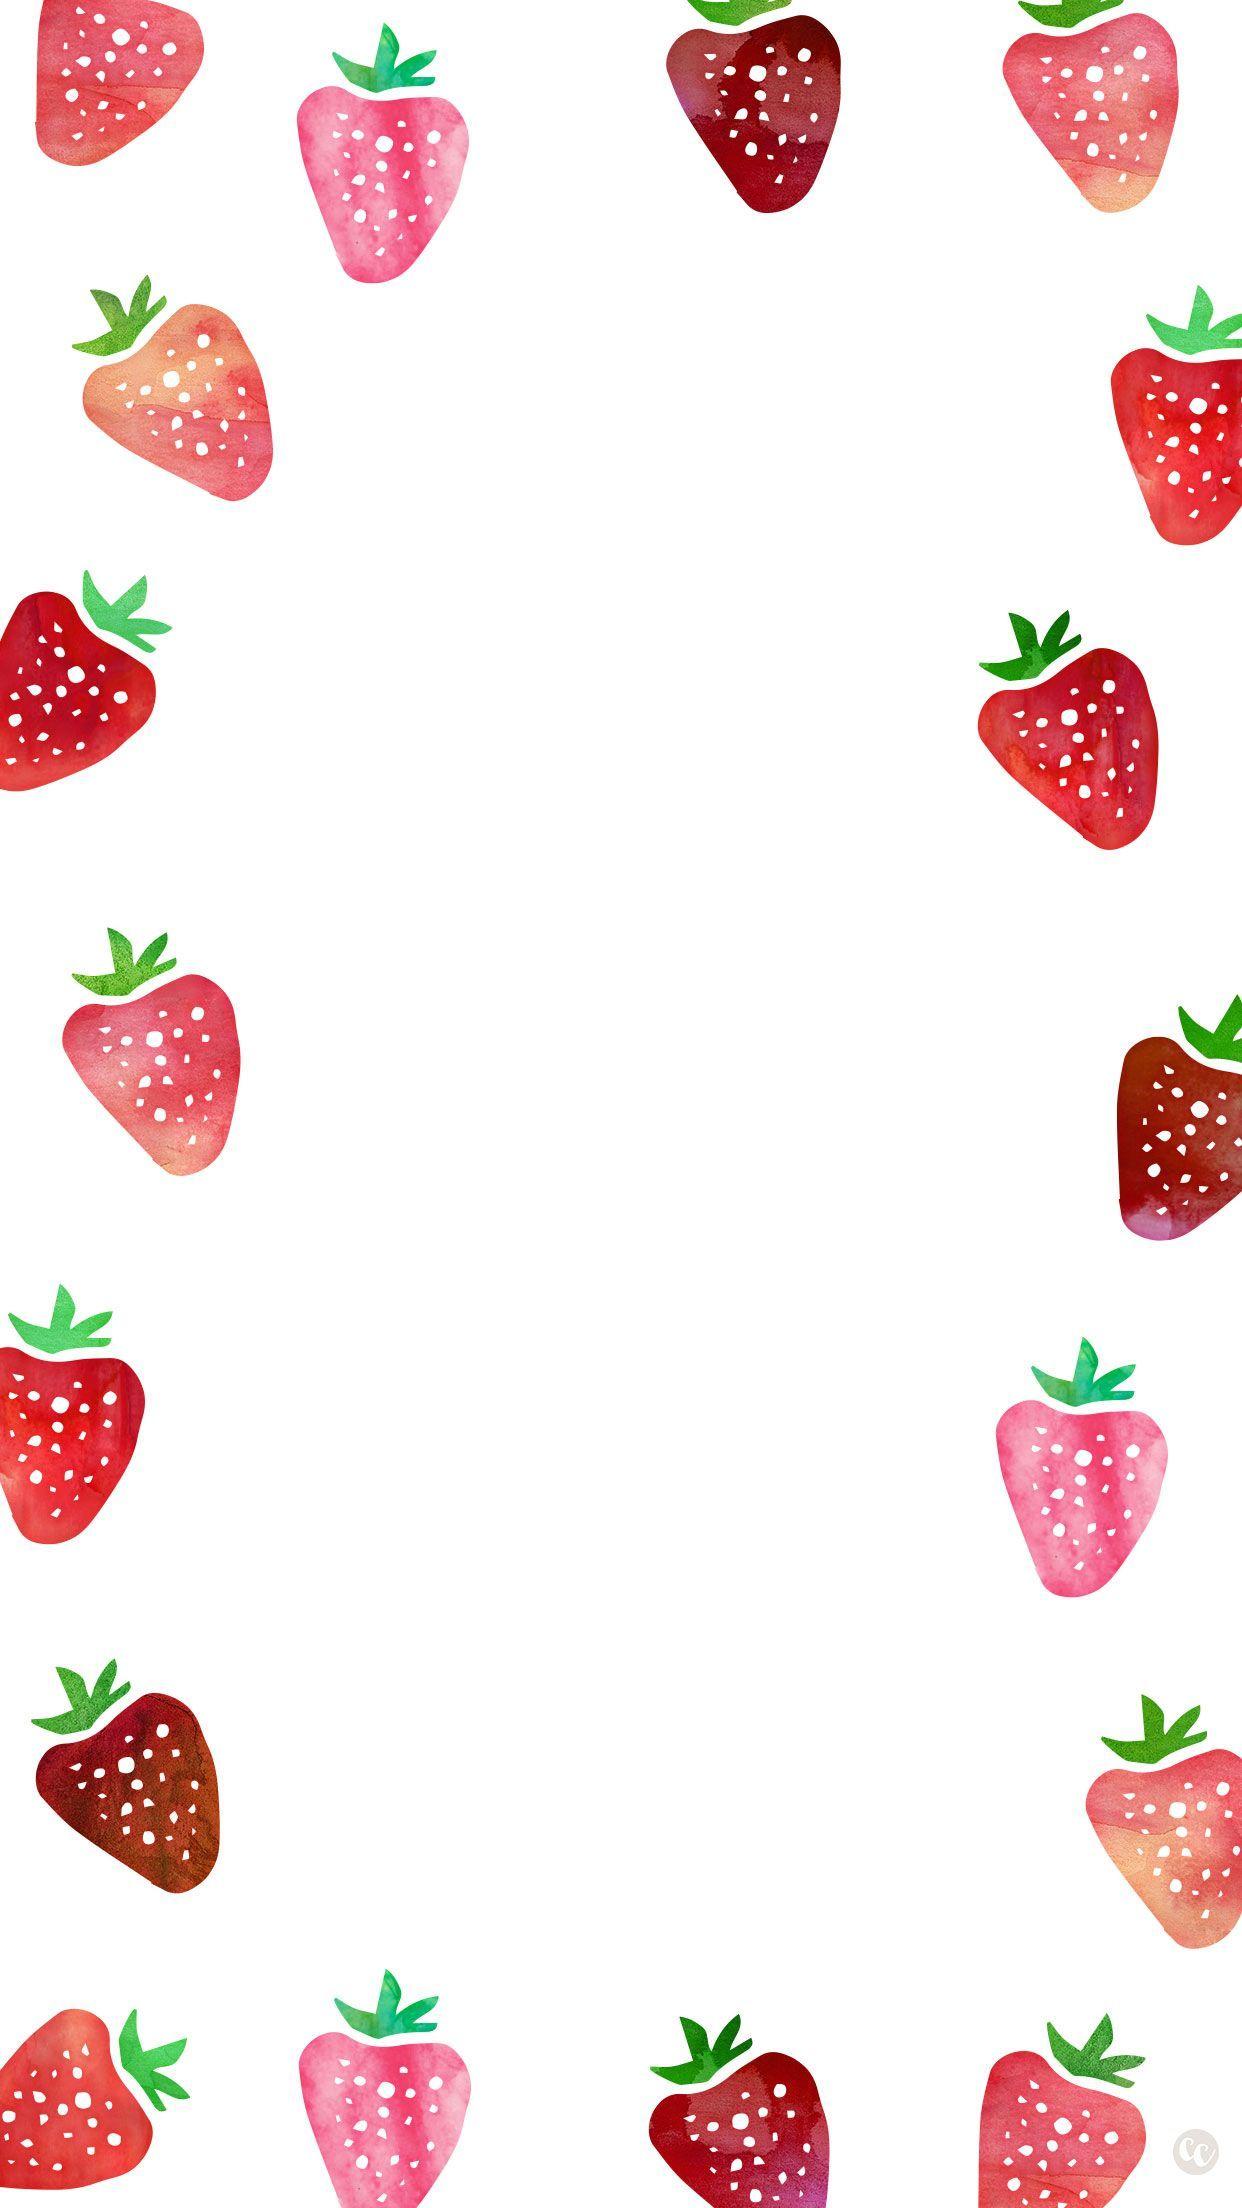 Free Wallpaper Downloads Strawberries Ipad Wallpaper Watercolor Cute Wallpapers For Ipad Smartphone Wallpaper